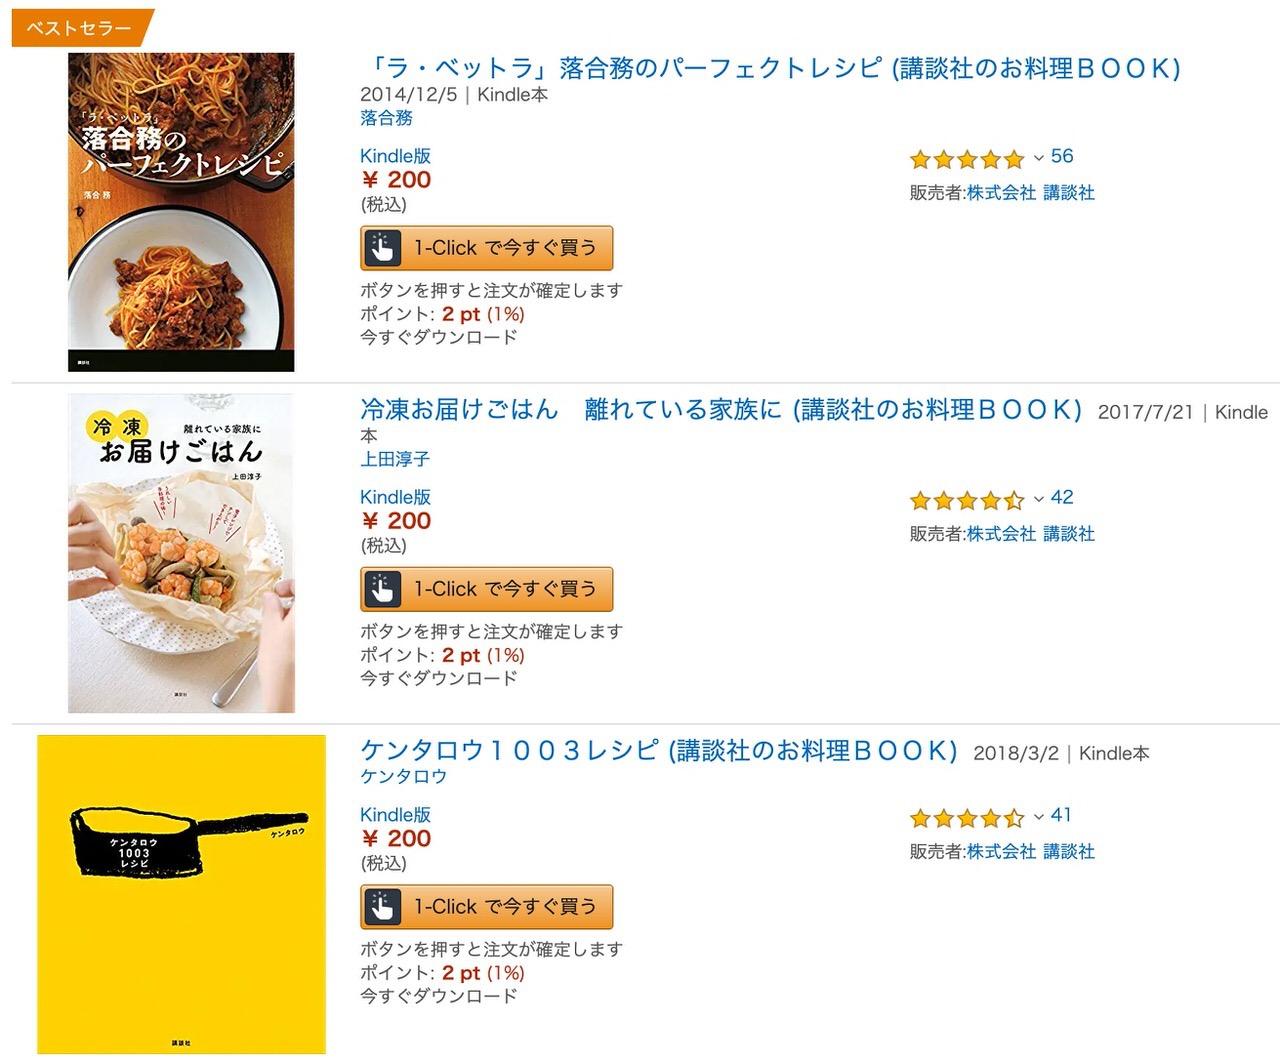 【Kindleセール】178冊が全て200円「お料理本フェア」(9/12まで)